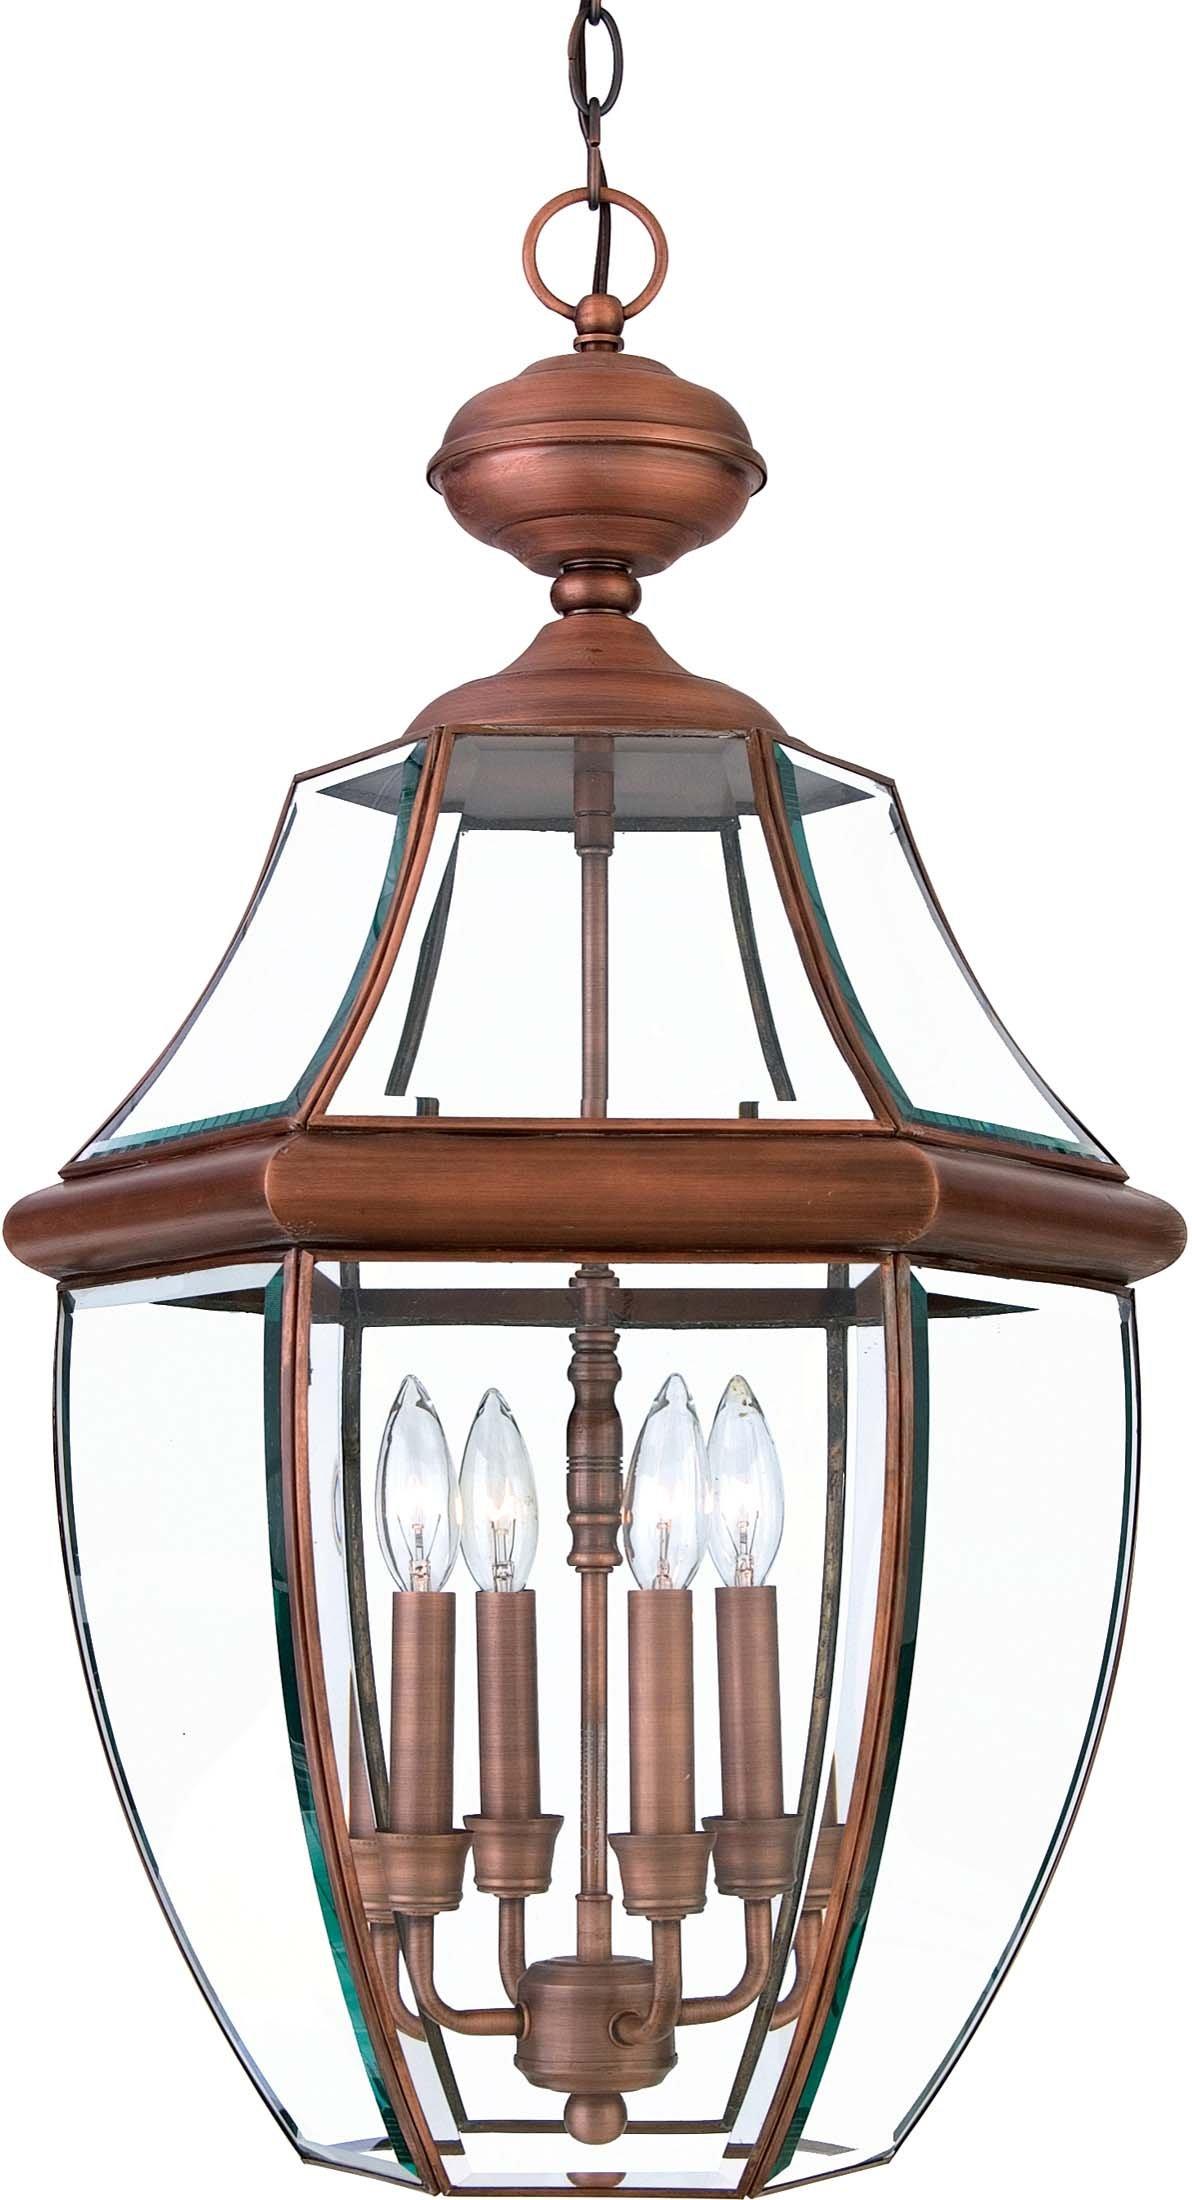 Quoizel NY1180AC  Newbury 4-Light Outdoor Lantern, Aged Copper